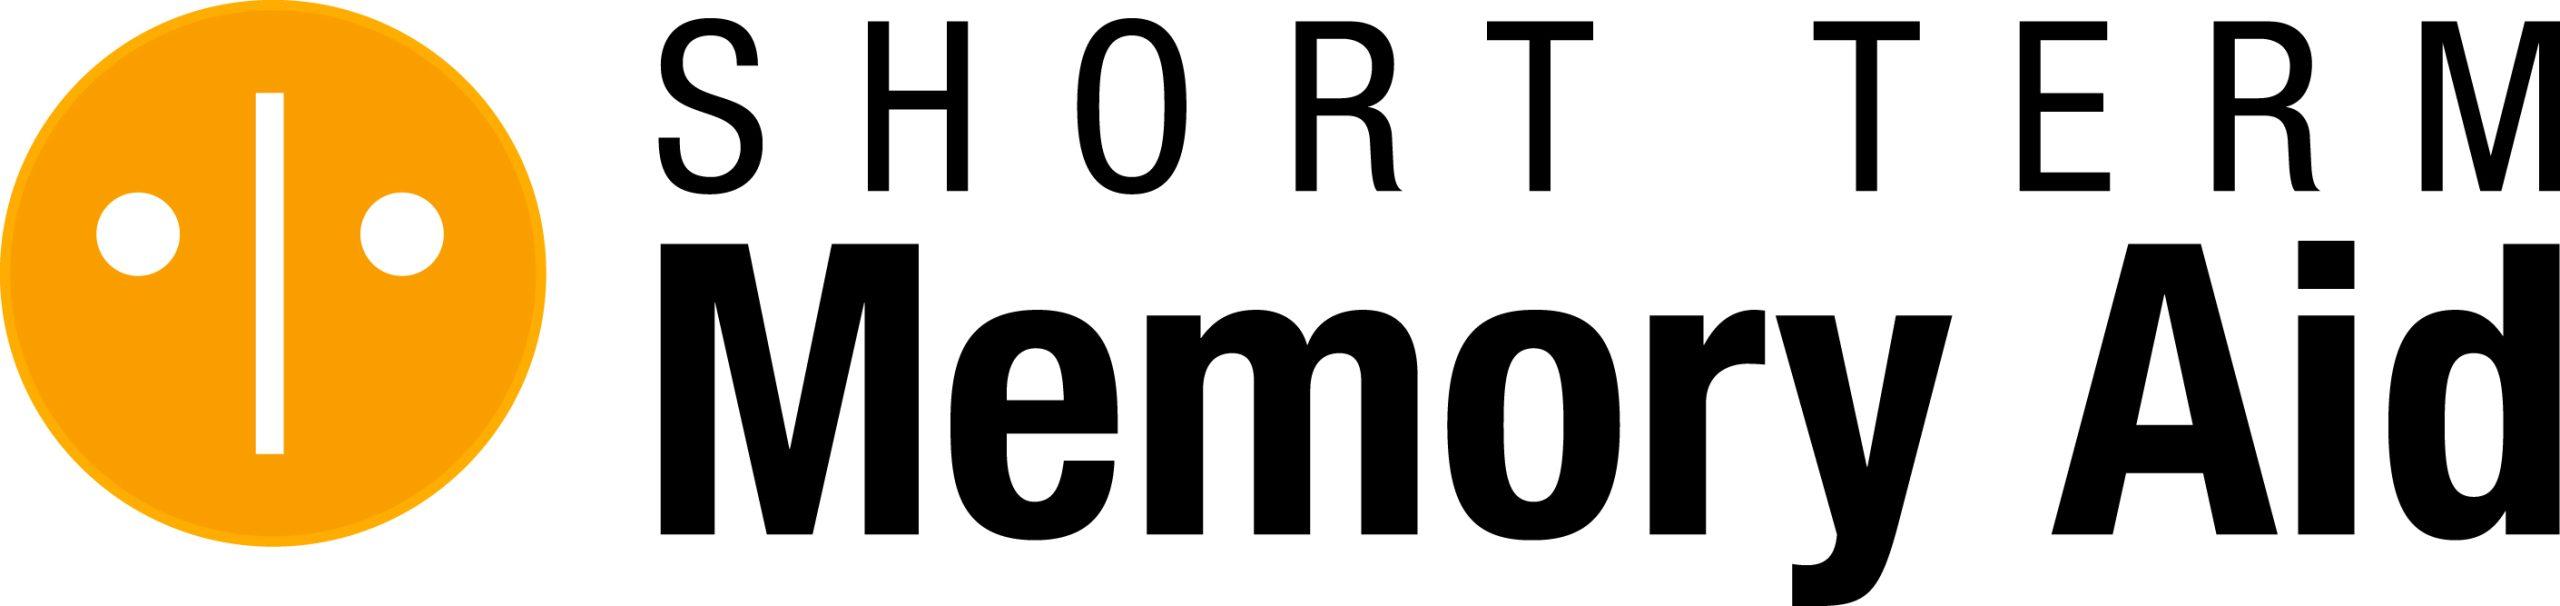 Short Term Memory Aid